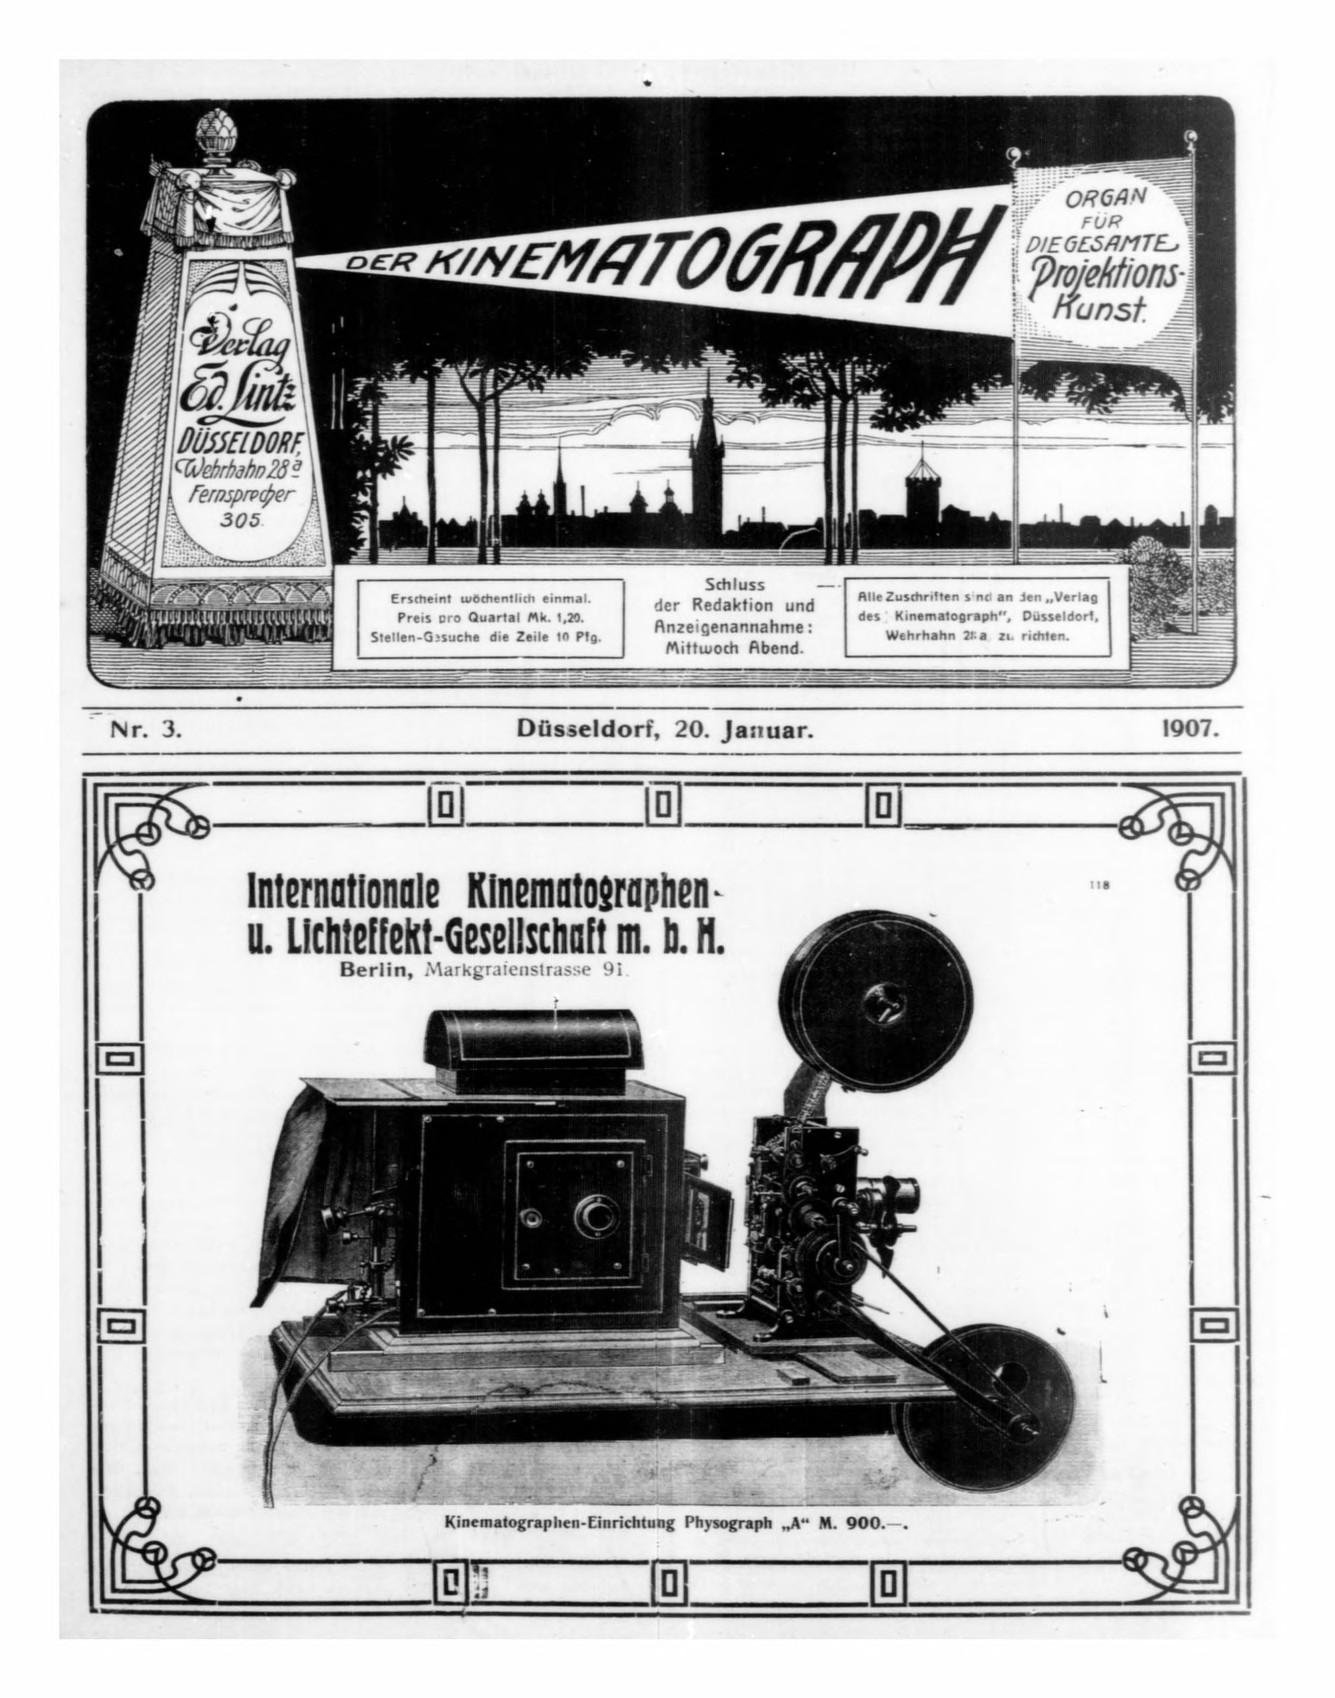 Kinematograph01-1907-01_jp2.zip&file=kinematograph01-1907-01_jp2%2fkinematograph01-1907-01_0024